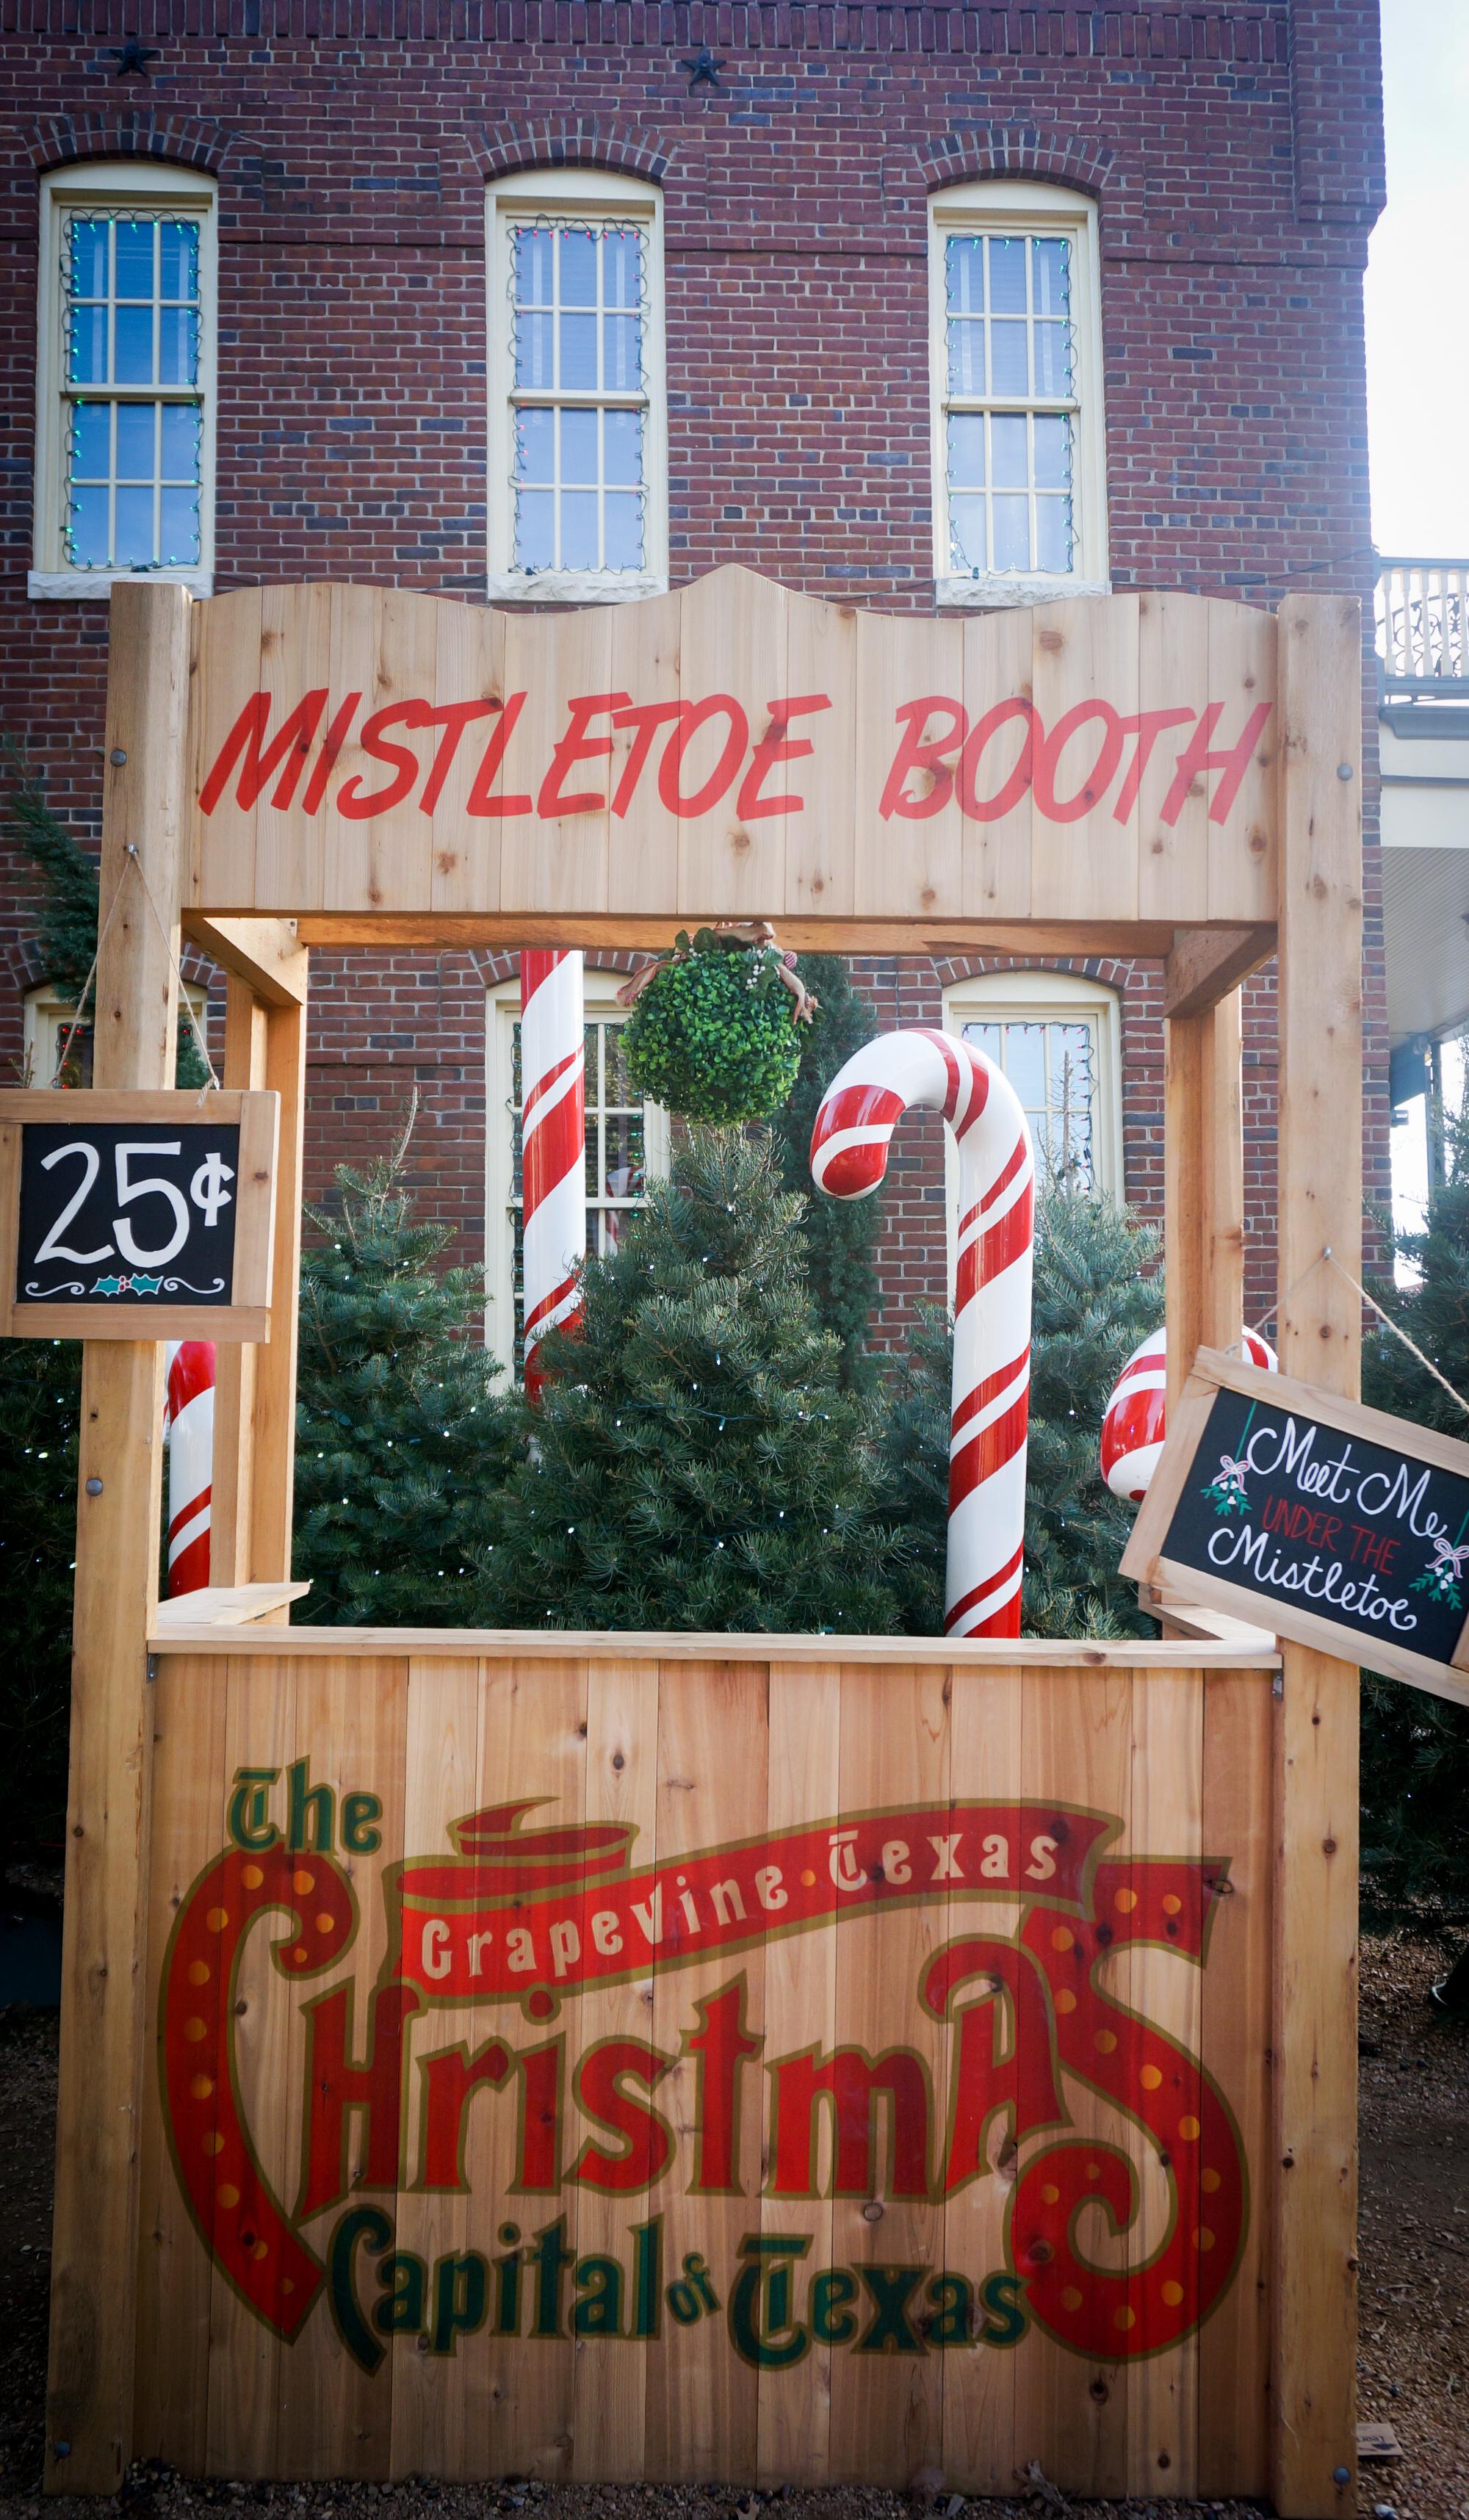 Share a Kiss at the Christmas Capital of Texas